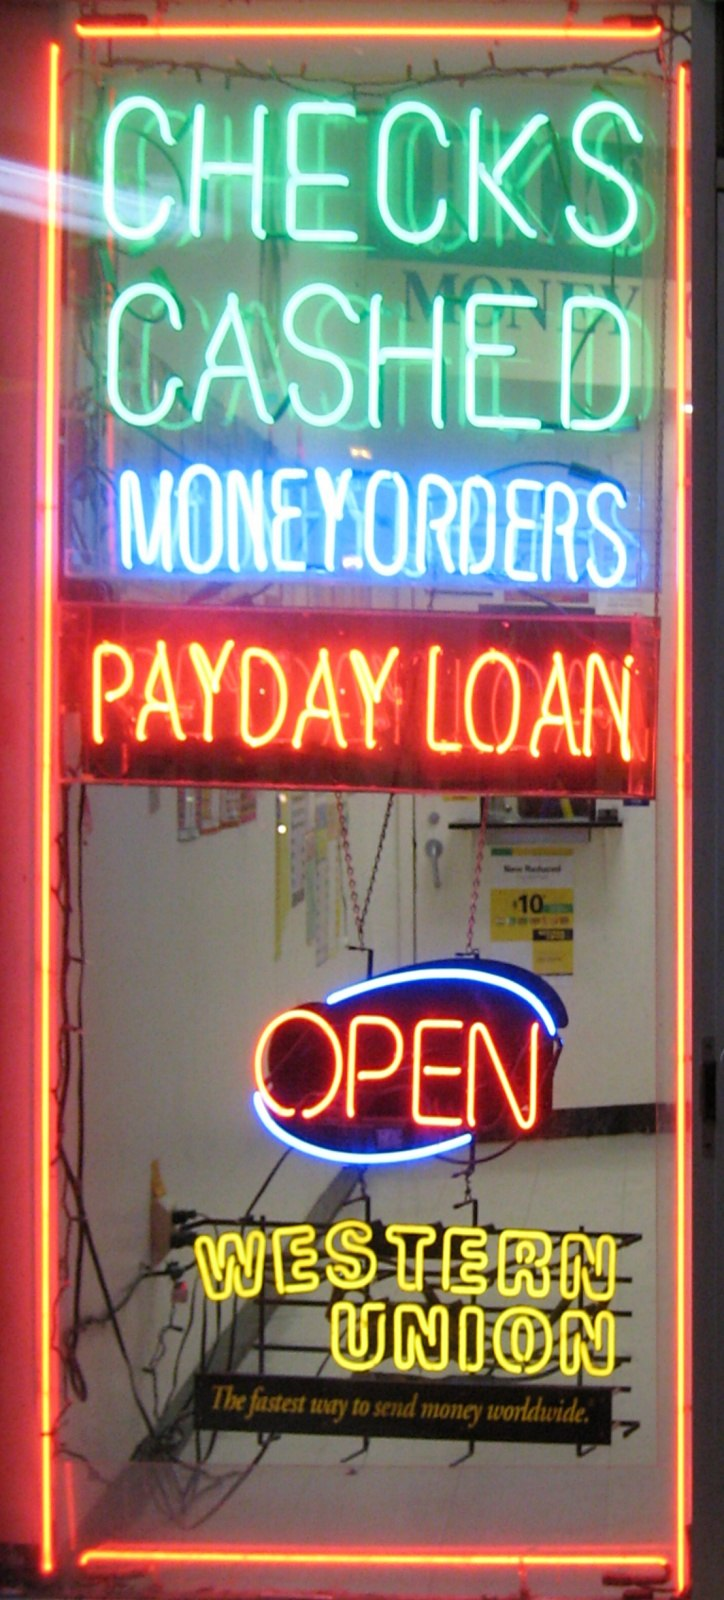 Payday loan shop window